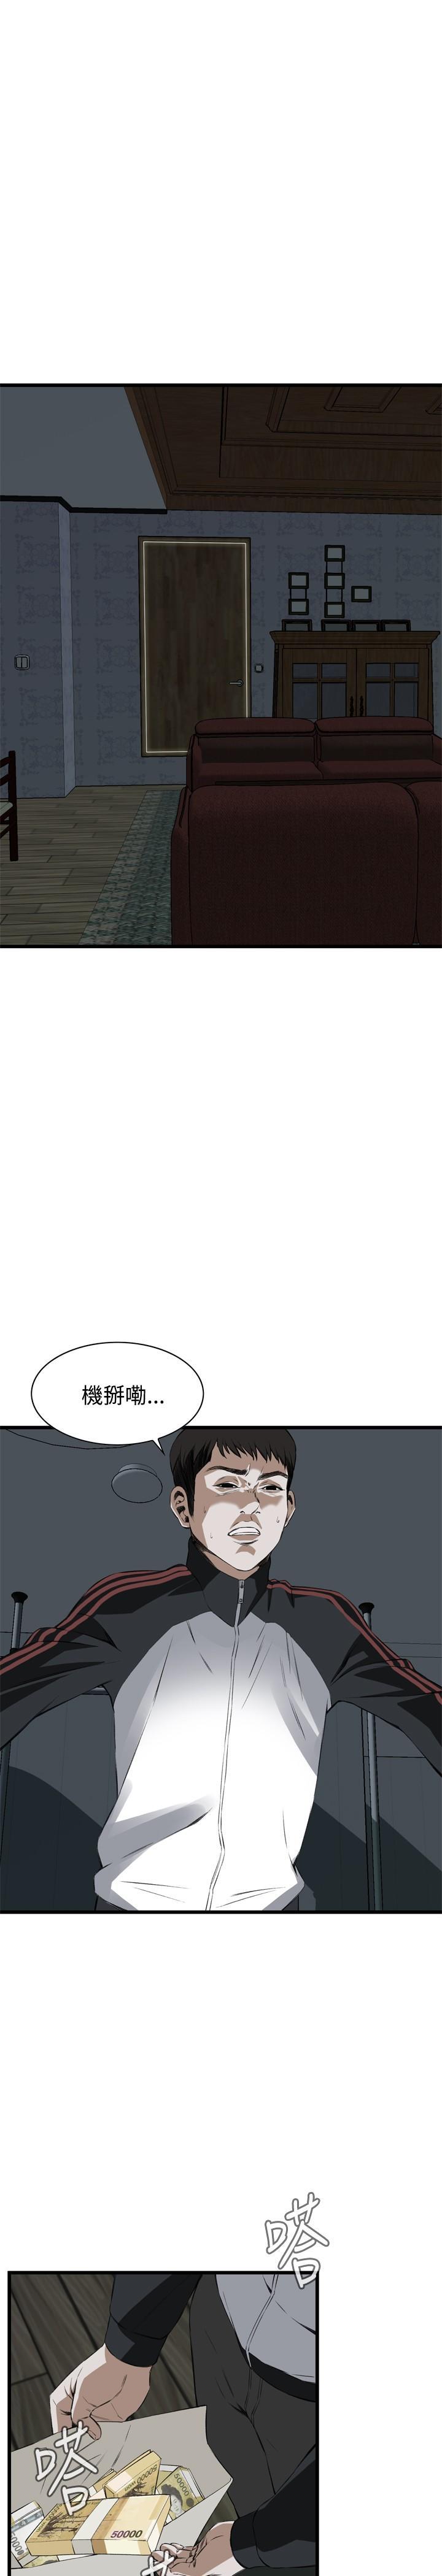 Take a Peek 偷窥 Ch.39~60 [Chinese]中文 482